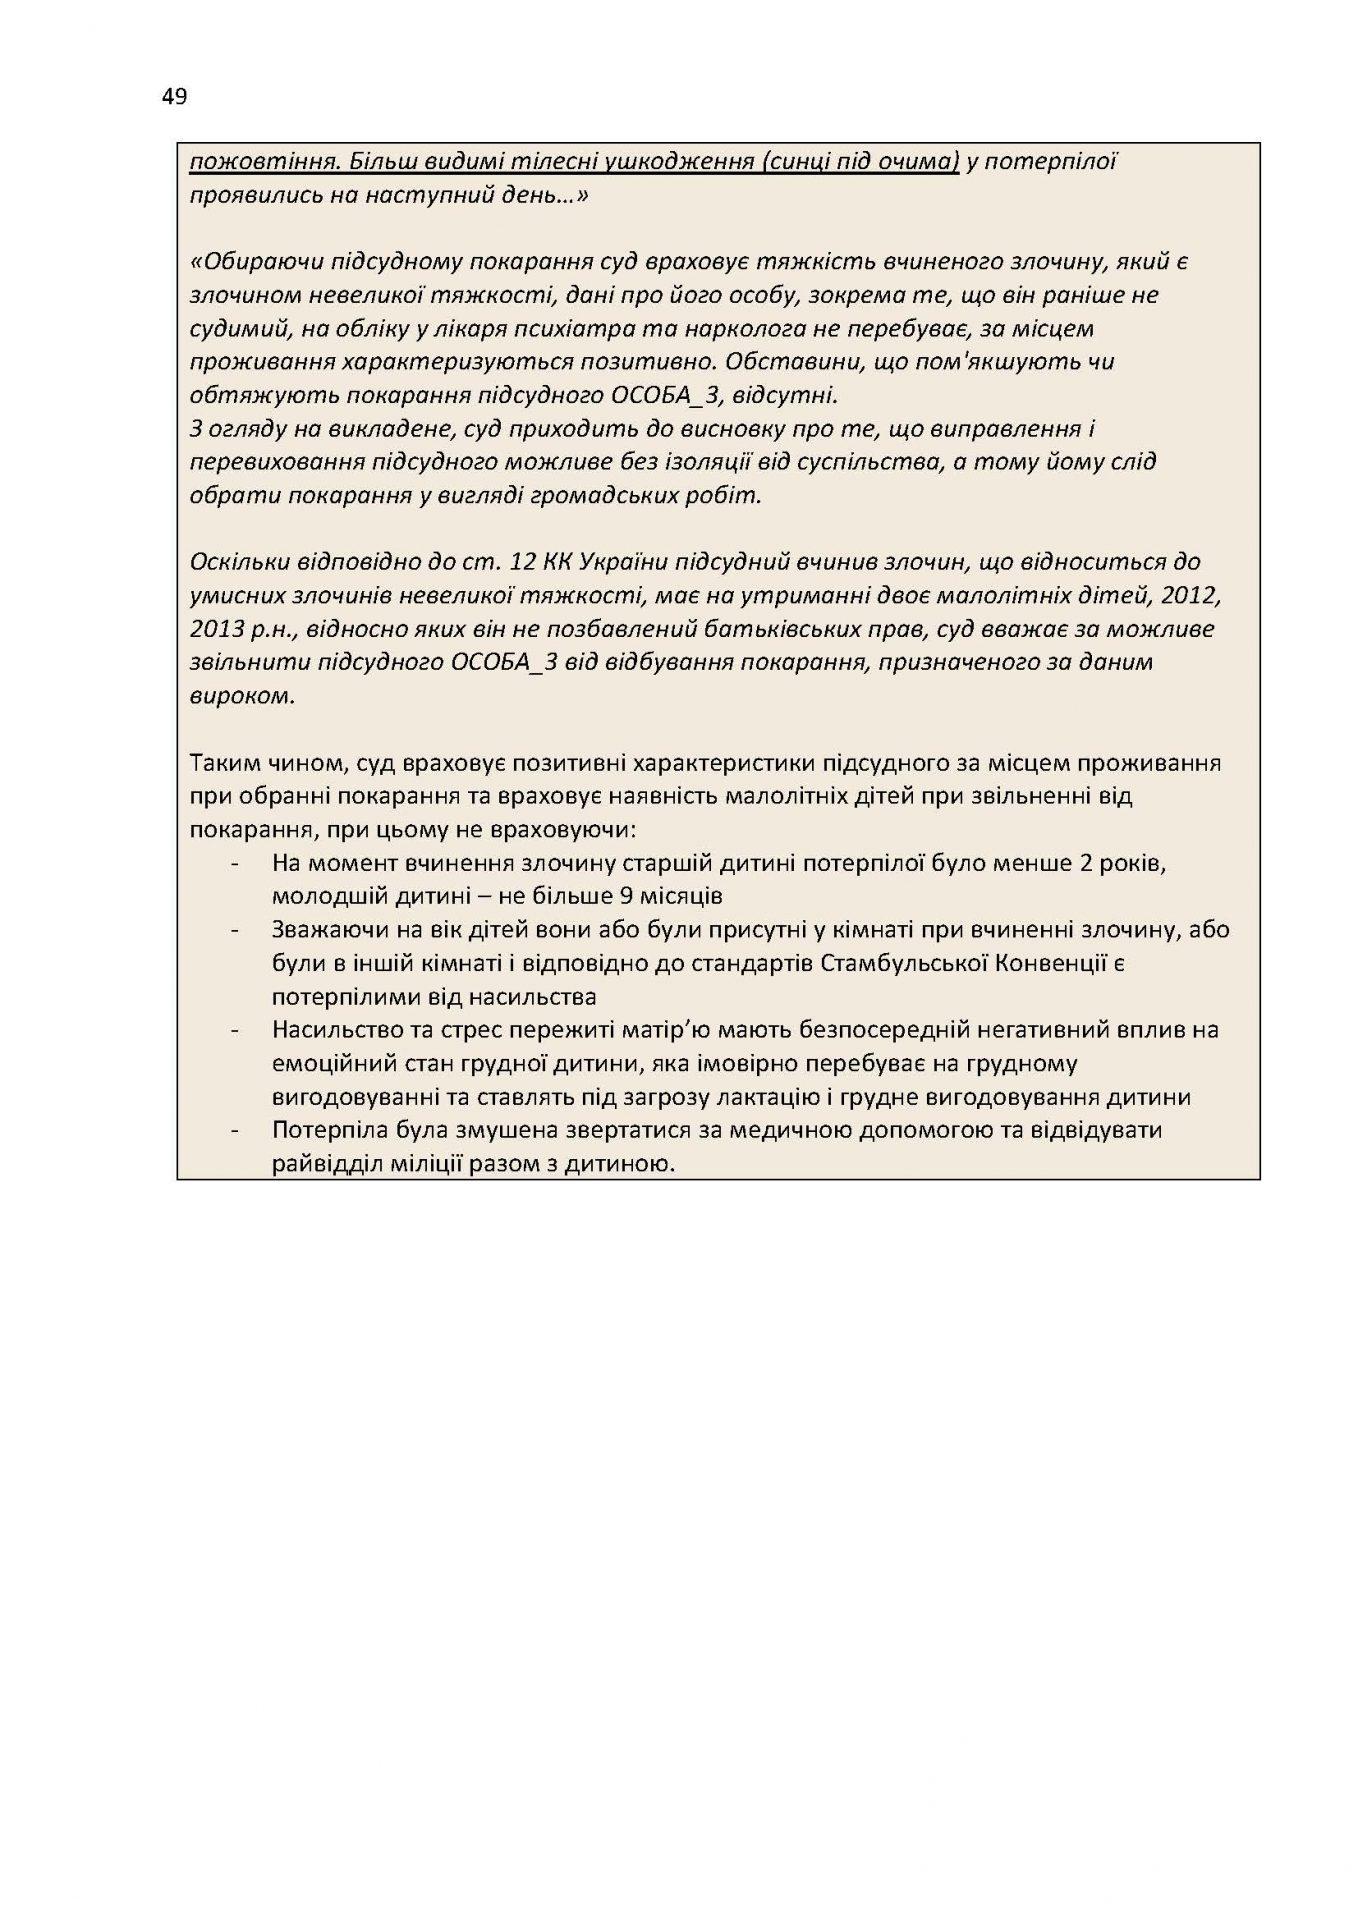 Draft Report monitoring print USAID_Страница_49